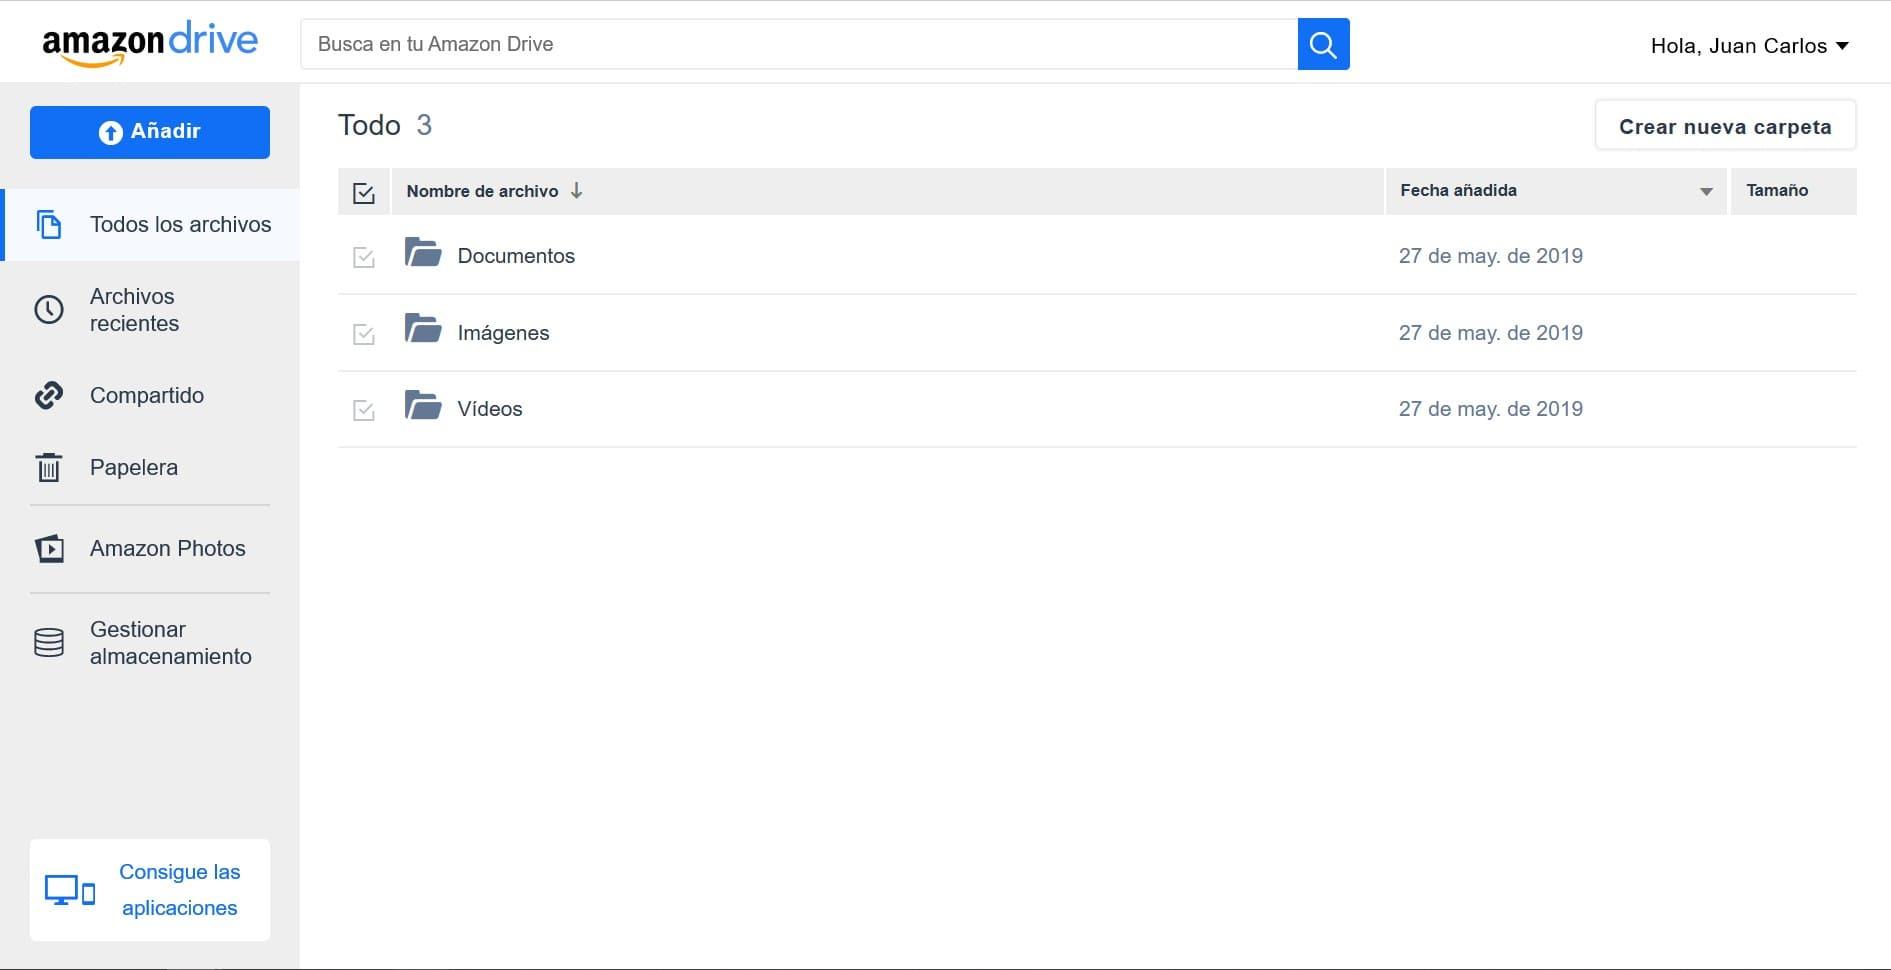 amazon drive alternativa a dropbox